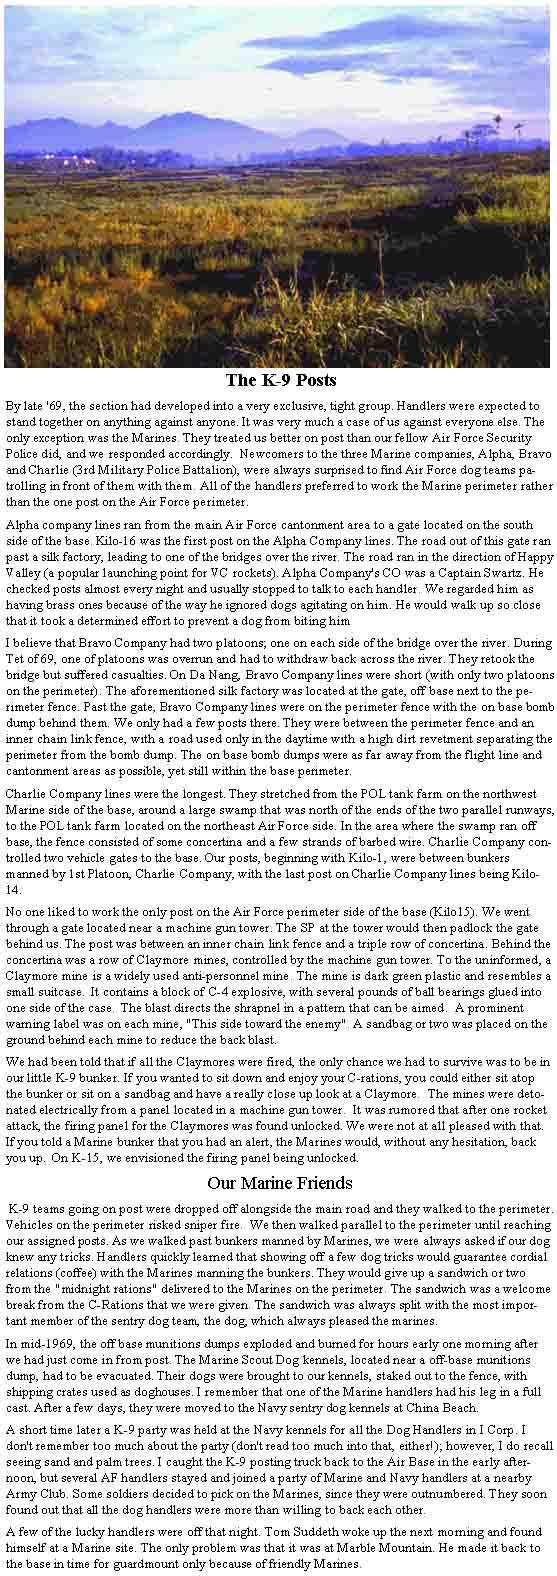 K-9 Posts article.